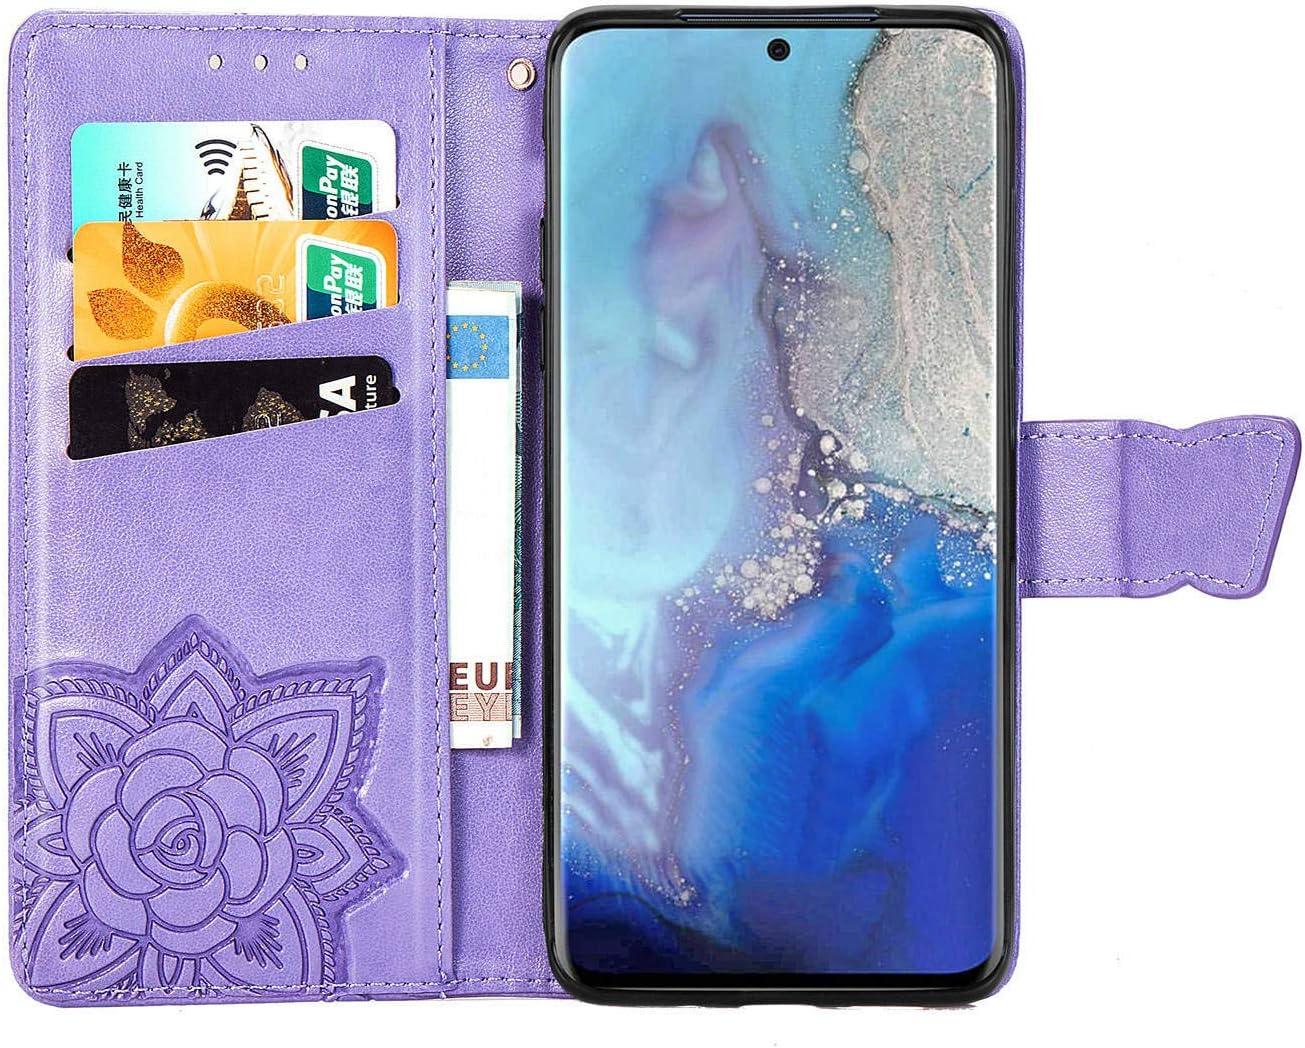 Thoankj Huawei Y6P H/ülle PU Leder Flip Notebook Slim Fit Wallet Phone Case S/ü/ße Schmetterling mit Kickstand Soft TPU Gel Bumper Folio Sto/ßfest Schutzh/ülle f/ür Huawei Y6P